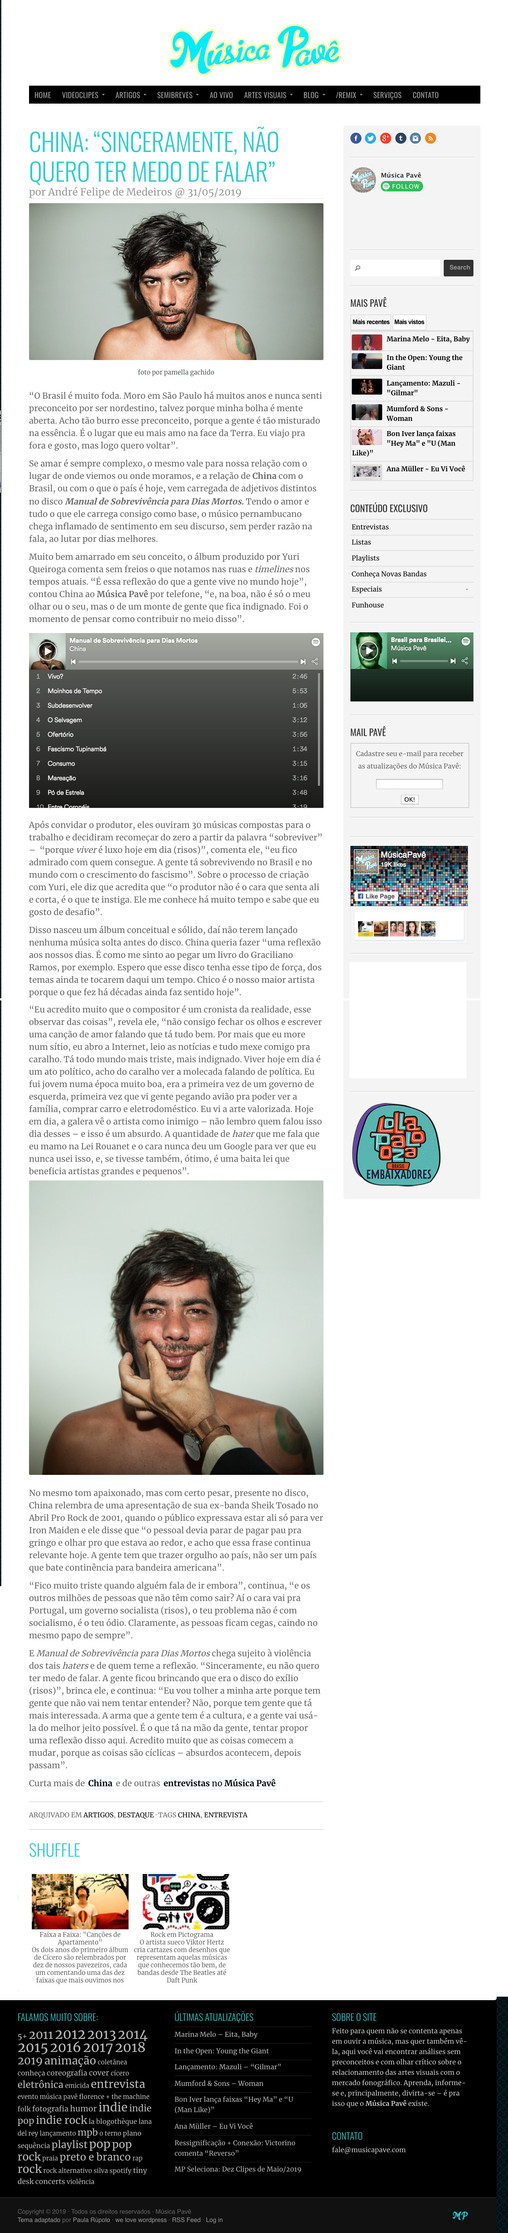 MSDM @ Música Pavê